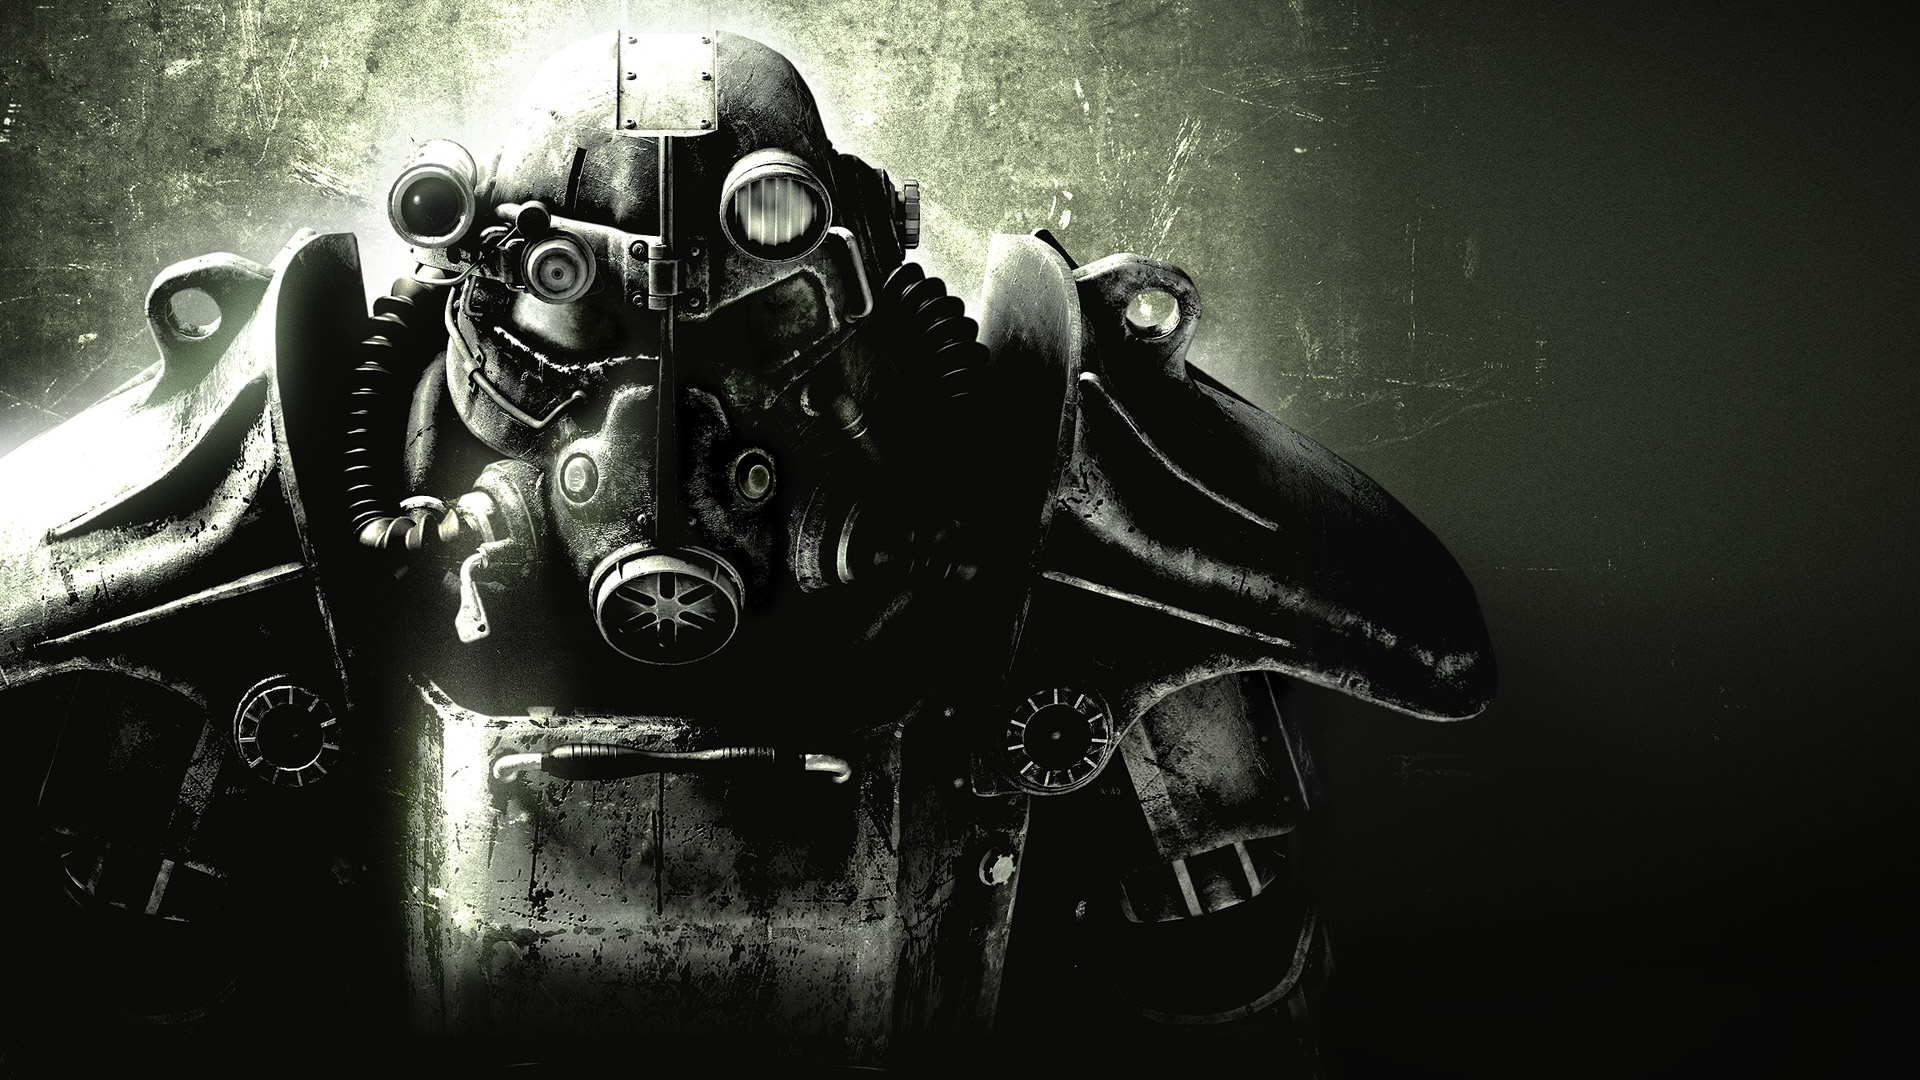 Fallout Fallout Wallpaper 1920x1080 Fallout Fallout 3 1920x1080